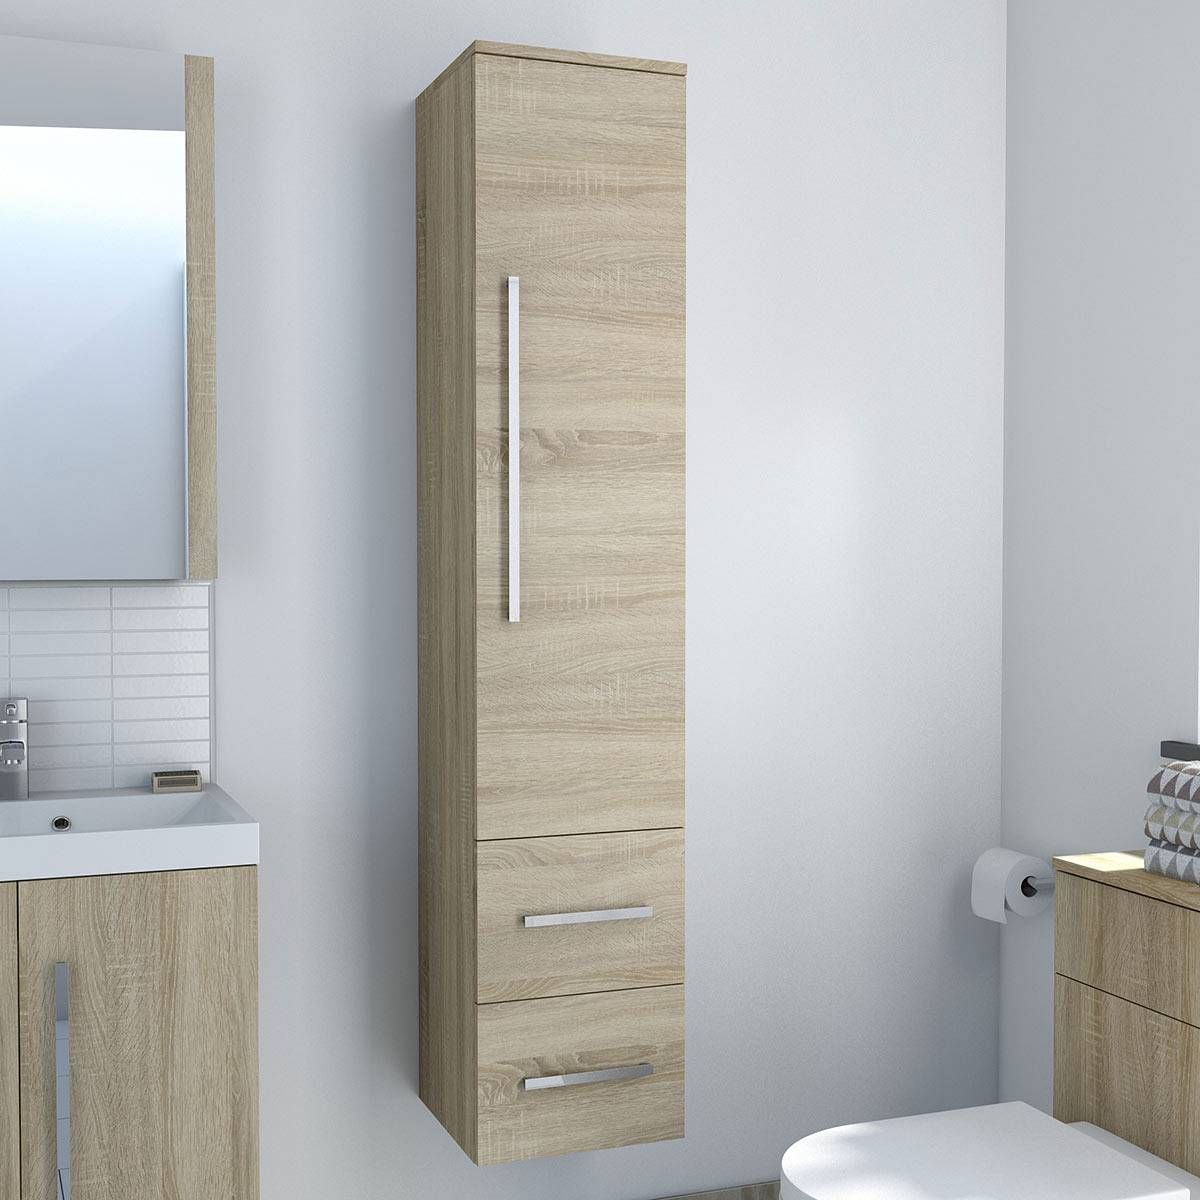 Drift Sawn Oak Tall Cabinet - Now £149.99 - Less Than Half Price ...